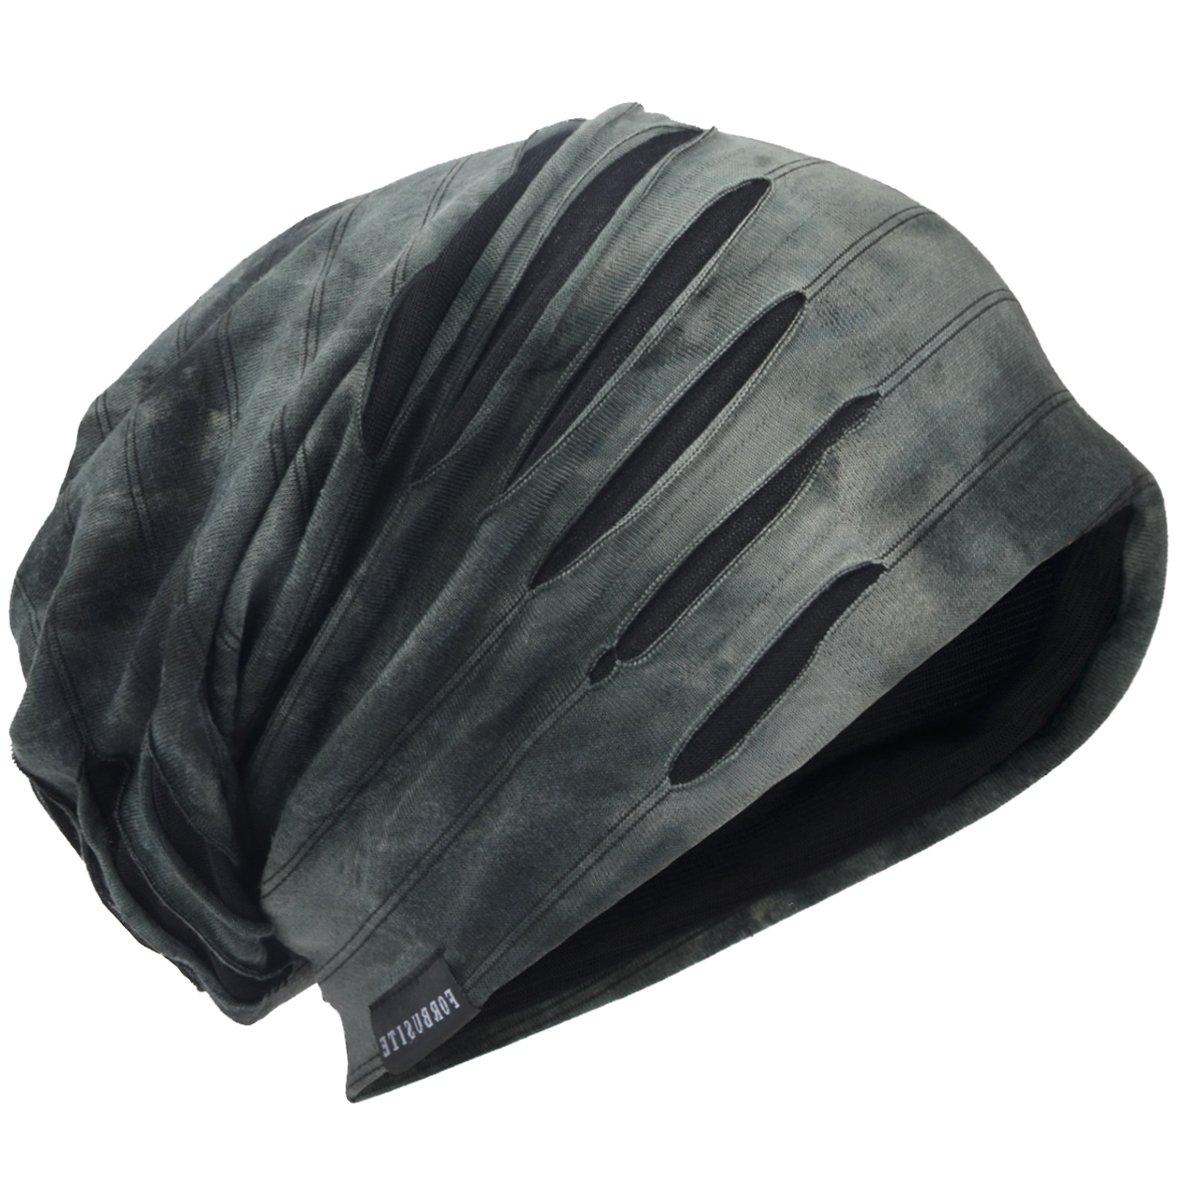 Mens Slouch Hollow Beanie Summer Skullcap B090 (Grey, Thin Cool)